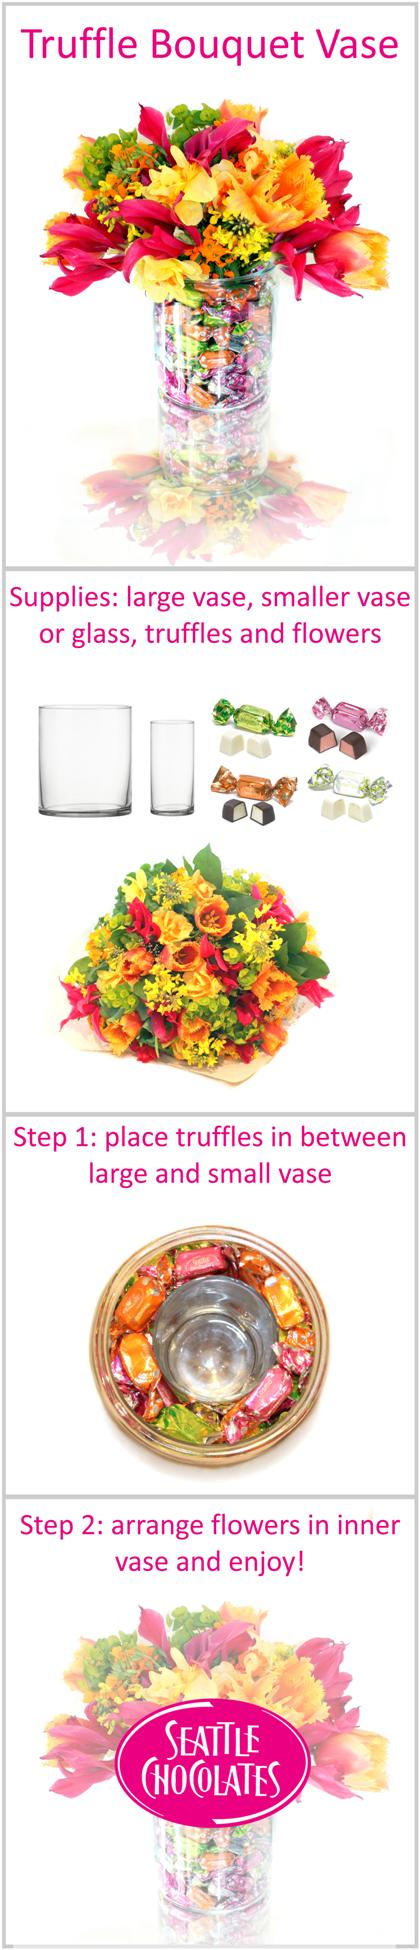 Seattle Chocolates truffles bouquet vase tutorial | Spring Palette ...